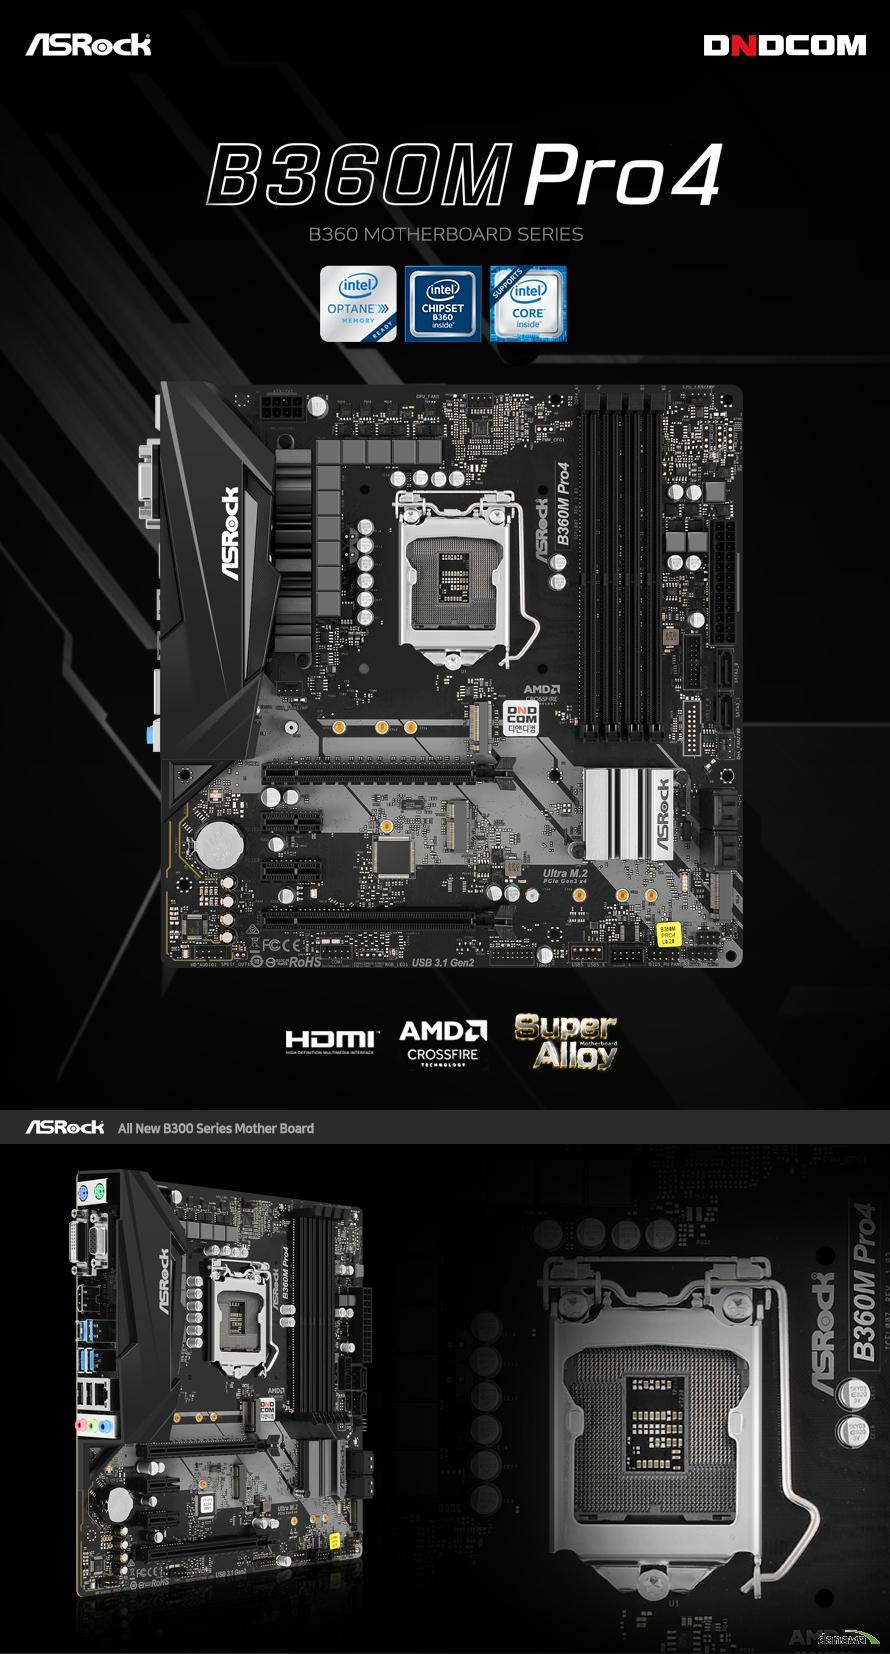 ASROCK B360M PRO4  8세대 인텔 프로세서 지원 LGA1151소켓 인텔 터보 부스트 테크놀로지 2.0 지원  인텔 B360 칩셋 지원  듀얼채널 DDR4 DIMM 메모리 지원 최대 64GB 메모리 지원 DDR4 2666 2400 2133 NON ECC UN BUFFERED 메모리 지원 ECC UDIMM 메모리 모듈 지원 XMP 2.0 지원  PCIE 3.0 X16 슬롯 2개  PCIE 3.0 X1 슬롯 2개 AMD 쿼드 크로스 파이어 지원  인텔 i219v 기가비트 랜 지원  SATA3 커넥터 6개 지원 울트라 m.2 슬롯 1개 및 m.2 슬롯 1개 지원  USB 3.1 gen2 a+c 및 gen1 5개 , 2.0 4개 지원 리얼텍 ALC892 7.1채널 HD 오디오 코덱 지원 윈도우 10 64비트 지원   KC인증 R REM ASR B360MPRO4  제조사의 사정에 따라 사전고지 없이 일부 제품사양이 변경될 수 있으며, 더 자세한 정보는 제조사 홈페이지 또는 제품 매뉴얼을 참고해주시기 바랍니다.  제품 구성   사용자 설명서 드라이버 CD IO쉴드  최고의 고객 만족을 위하여 디앤디컴 에서는 3년 무상 품질 보증 서비스를 제공합니다.